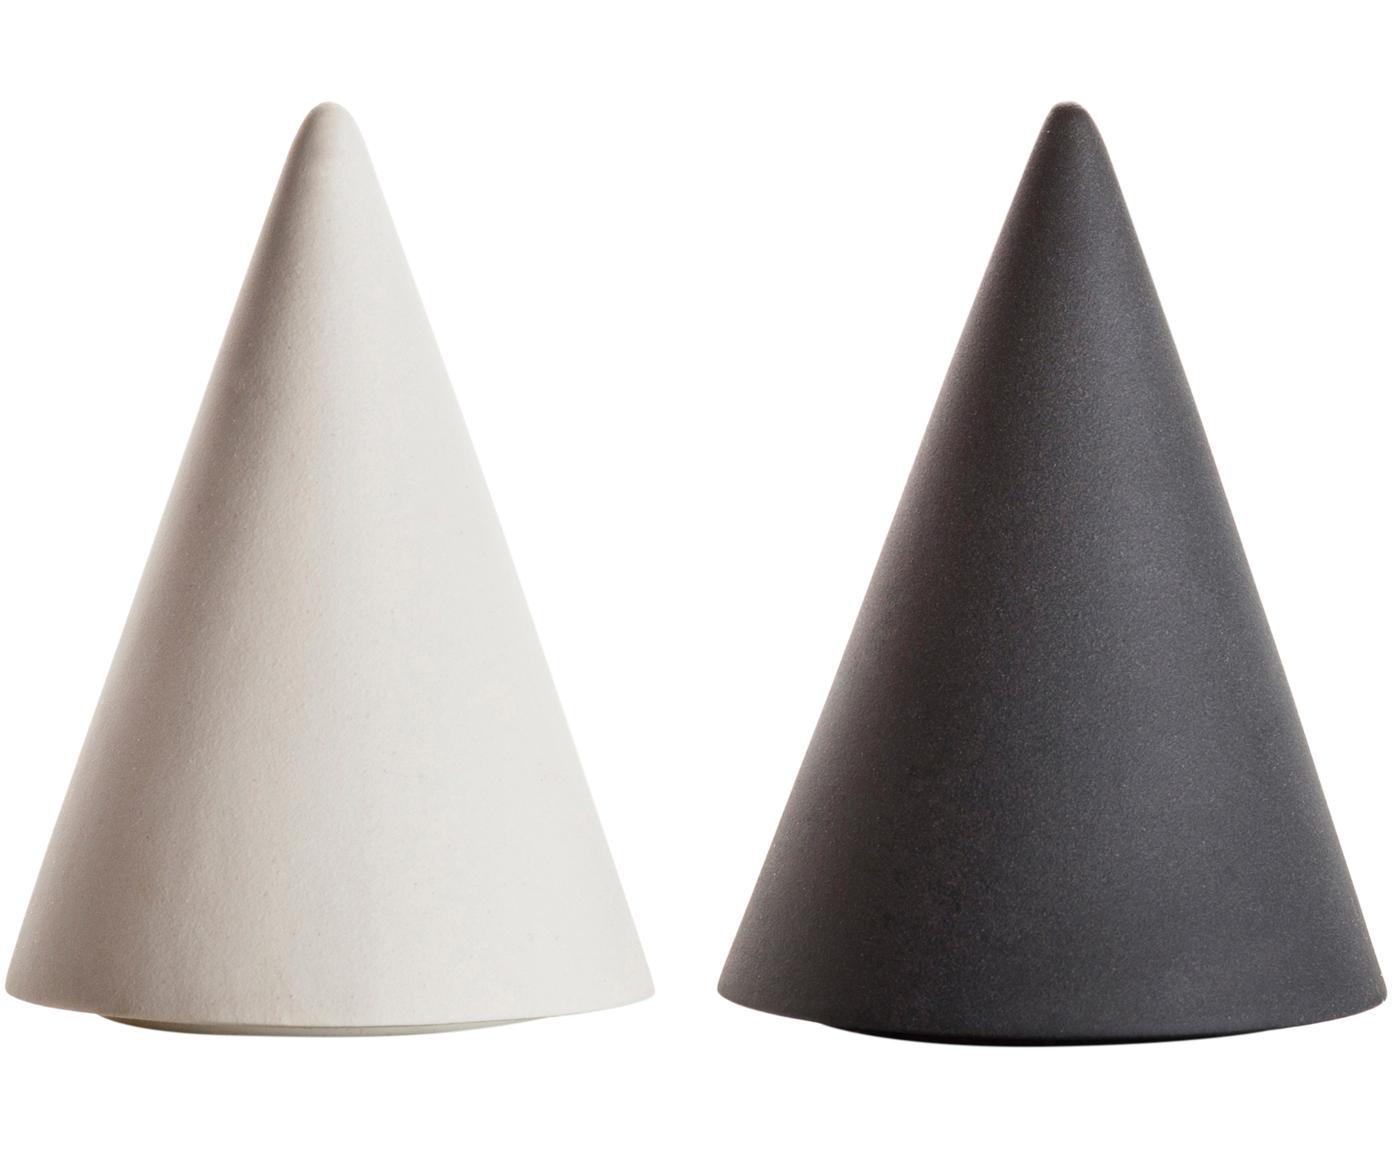 Design zout- en peperstrooier Cone, 2-delig, Porselein, siliconen, Wit, antraciet, Ø 6 x H 8 cm